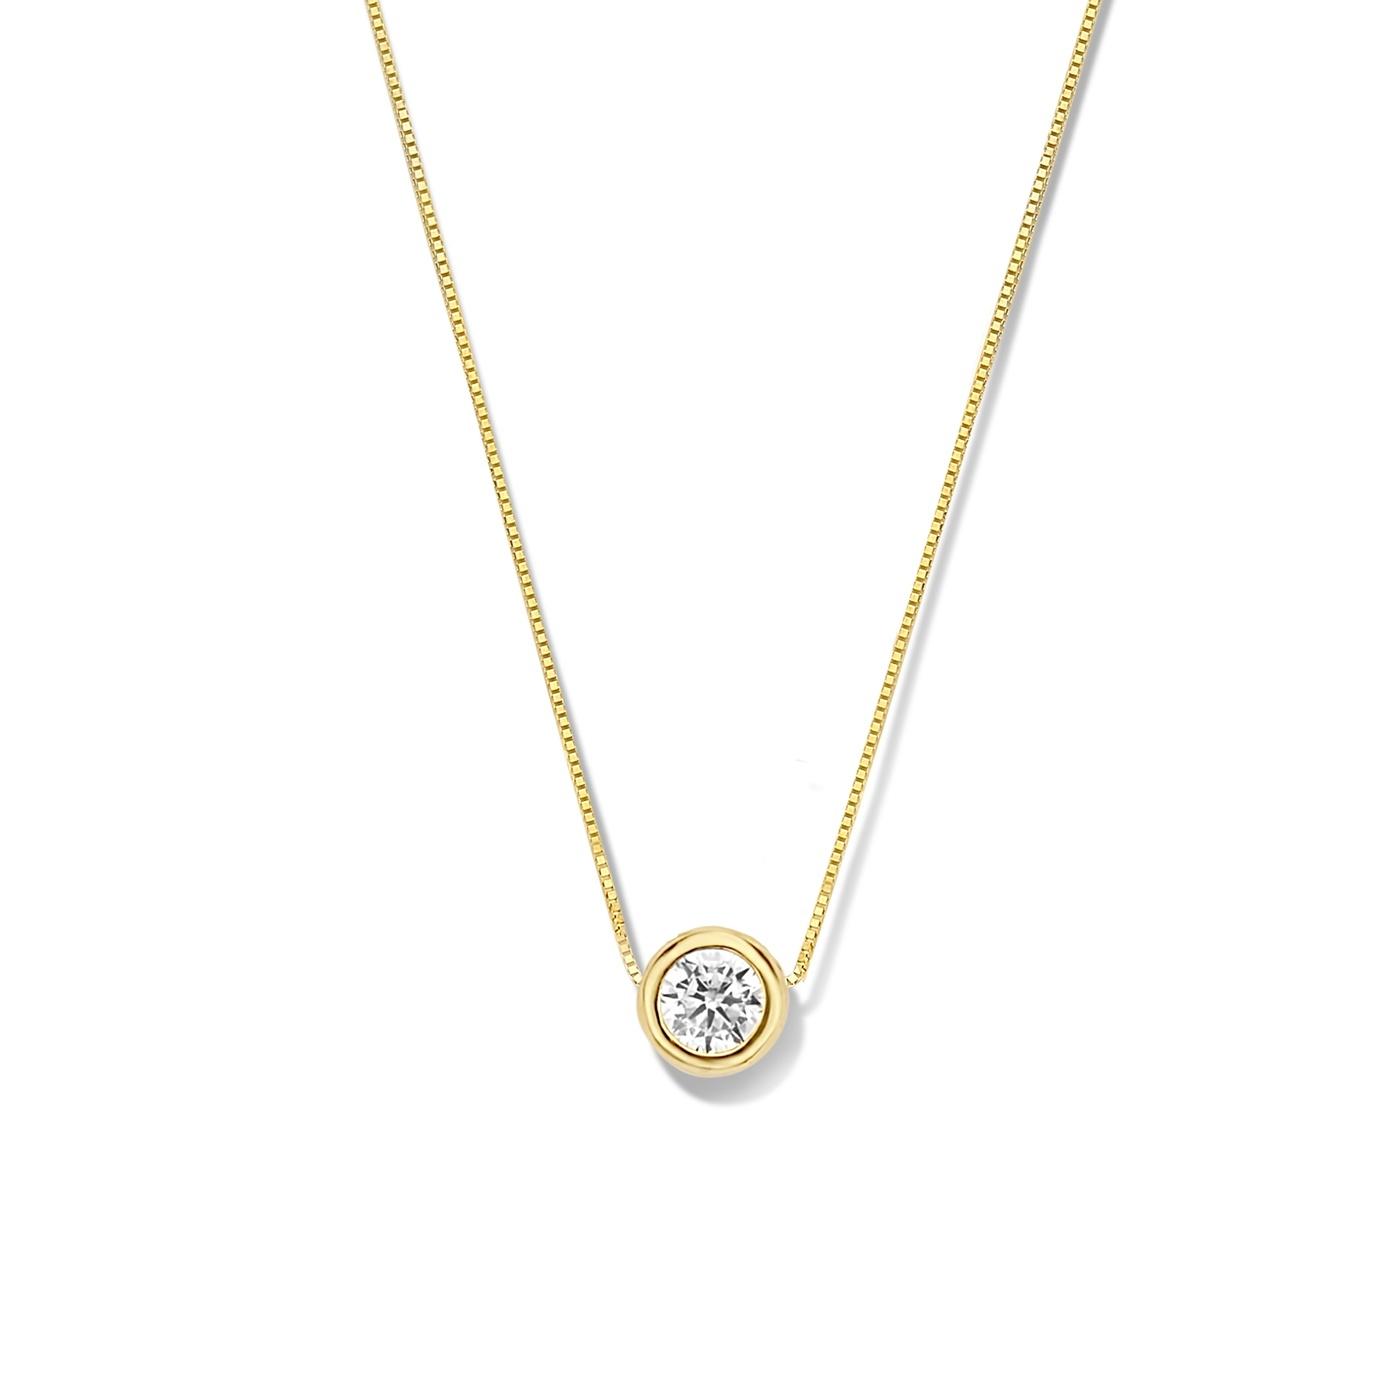 Isabel Bernard Le Marais Lison 14 carat gold necklace zirconia